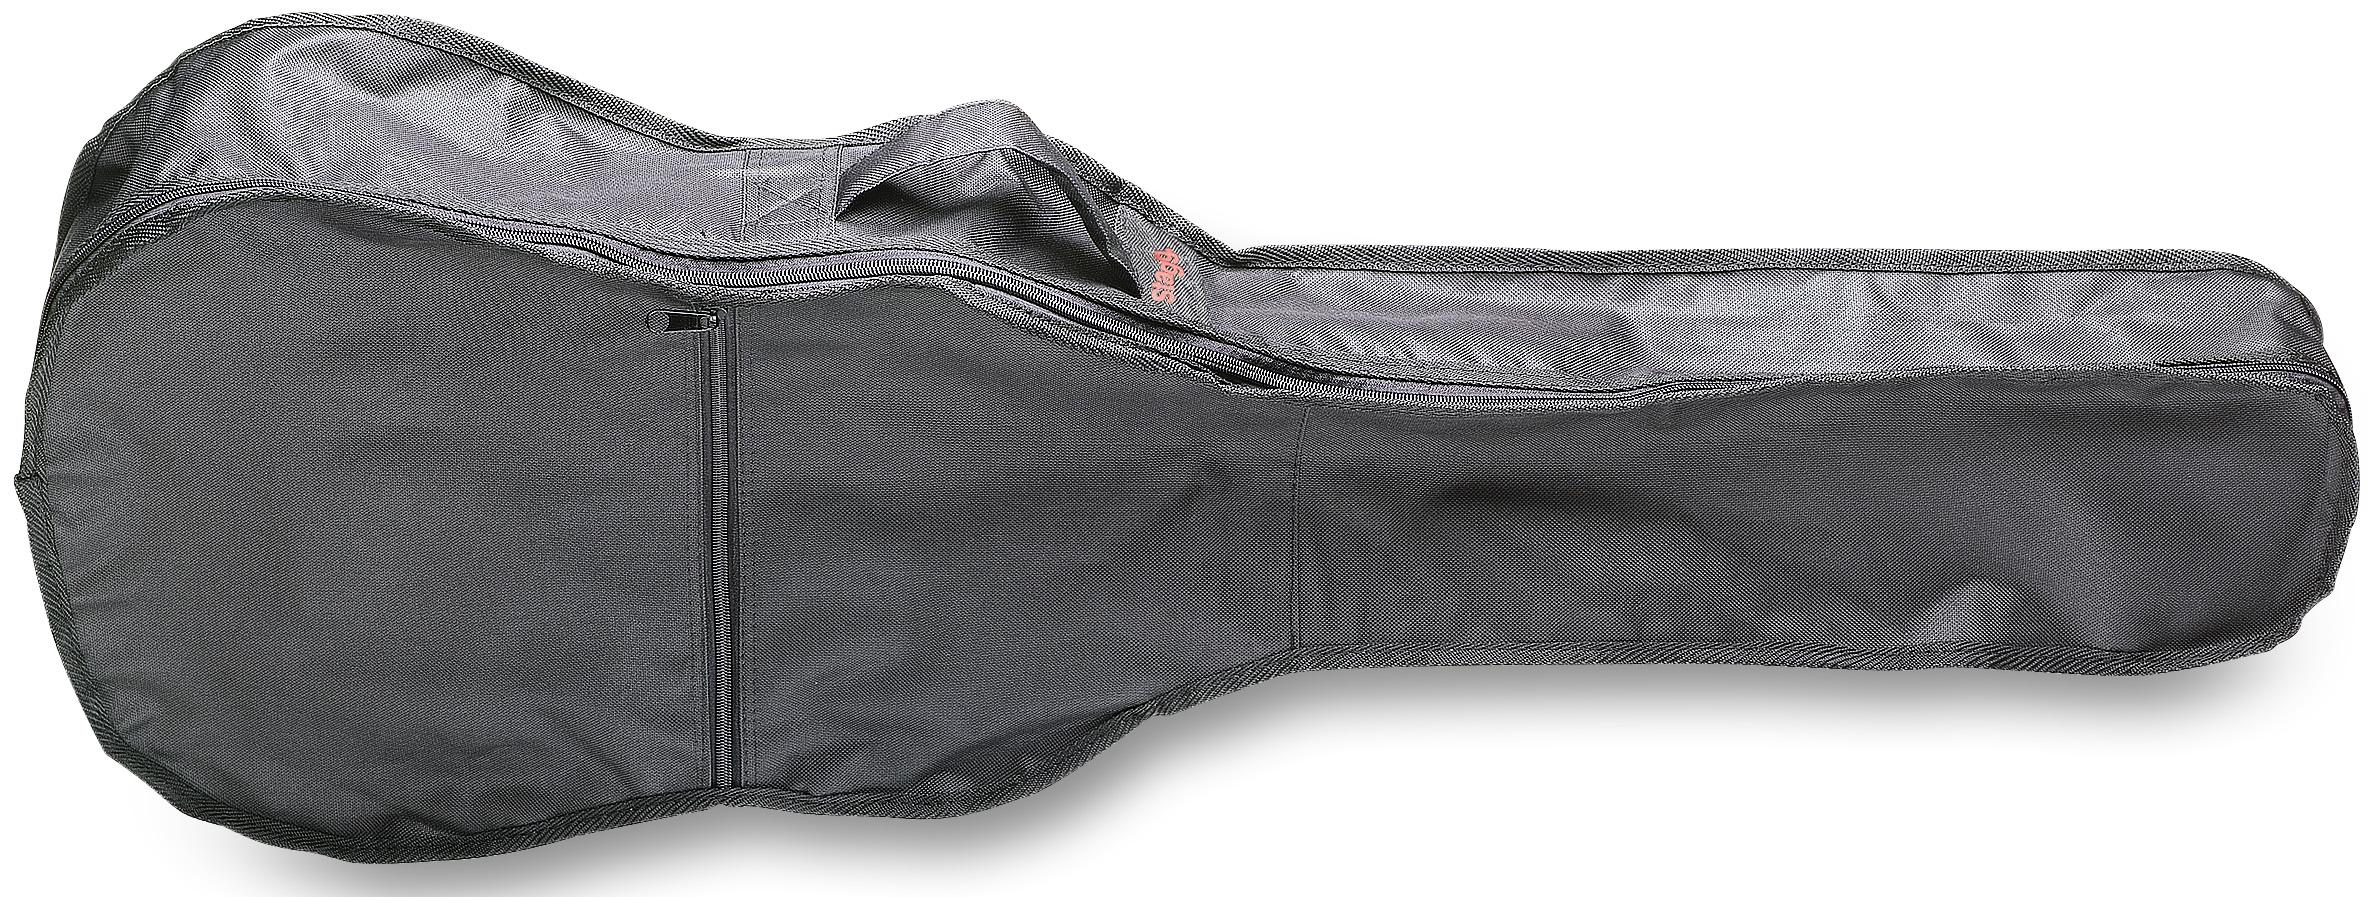 Stagg STB-1 C3, pouzdro pro 3/4 klasickou kytaru